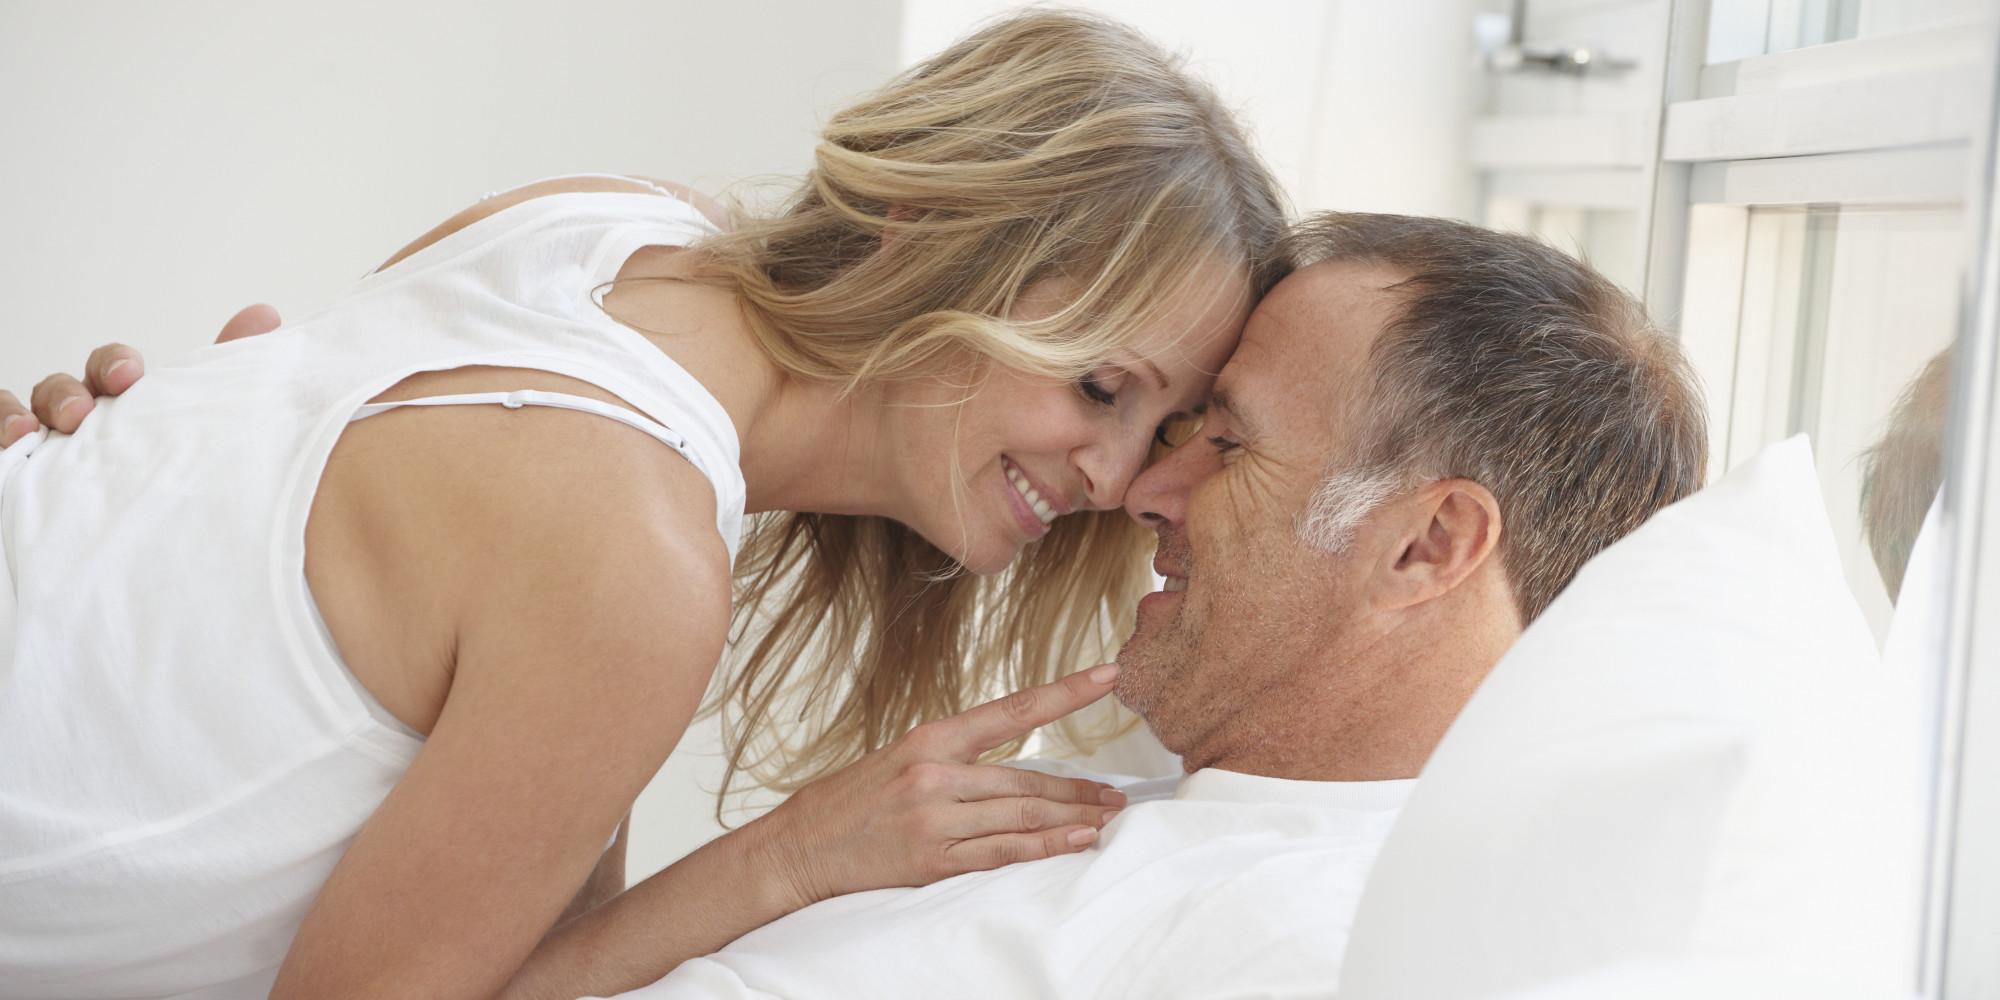 dating viagra speed dating ottawa over 40